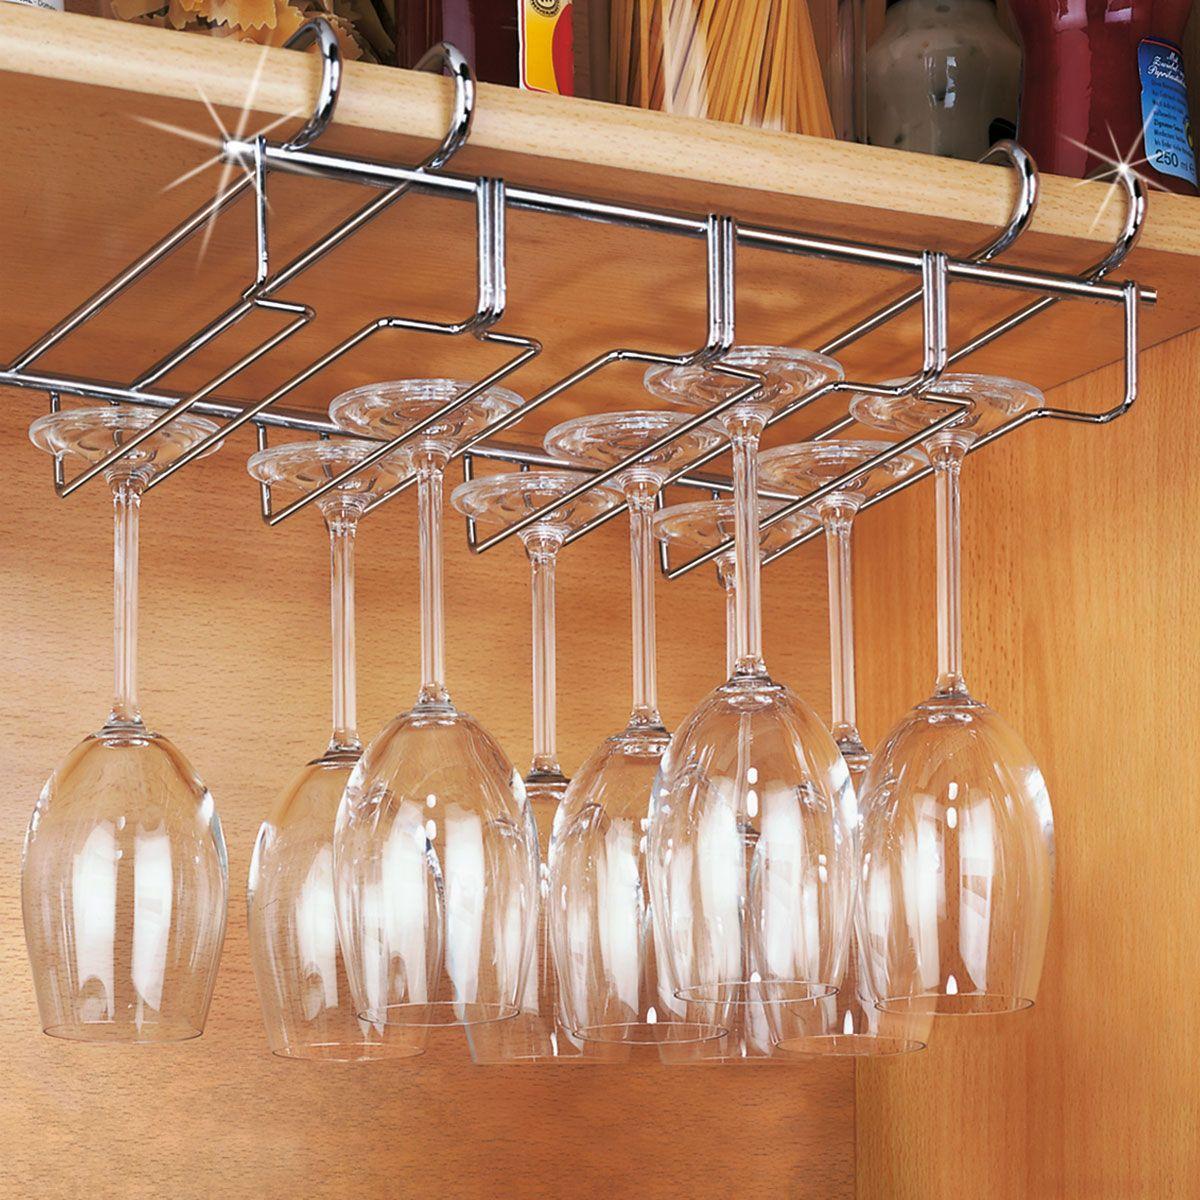 porte-verres - rack pour 12 verres (2748140100) : achat / vente